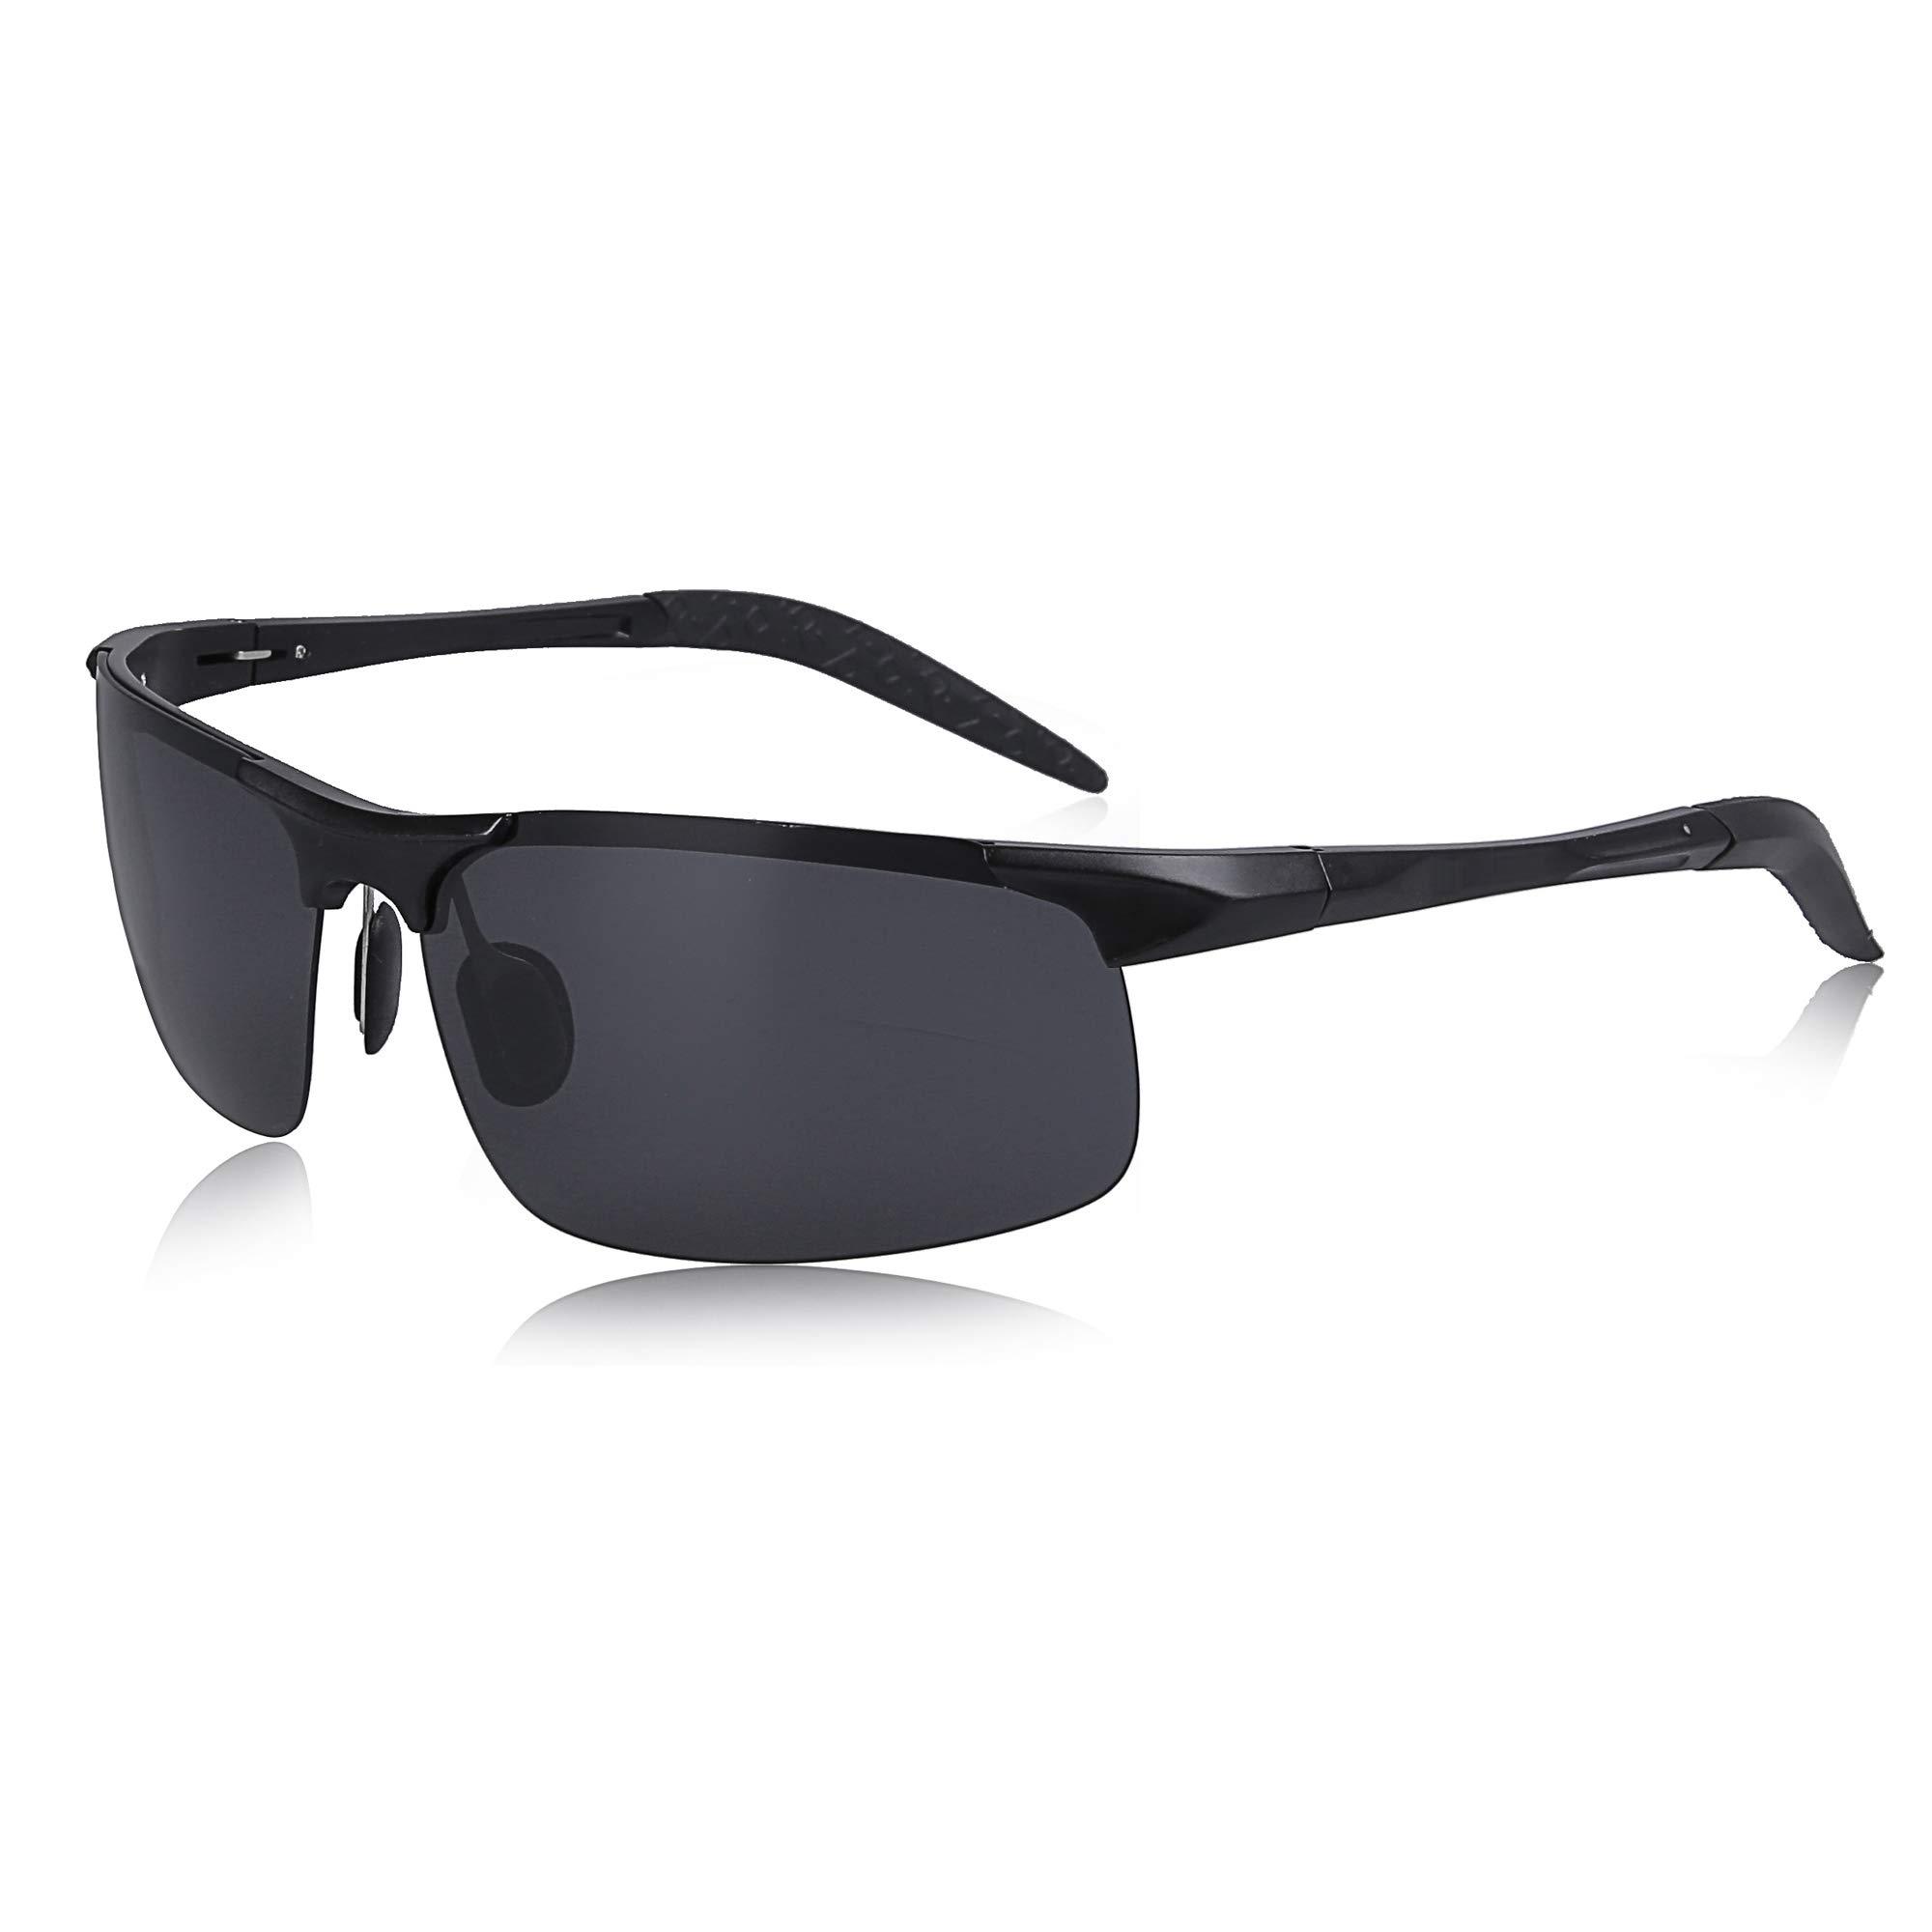 f119cc3f73 SUNGAIT Men s Polarized Sunglasses for Driving Fishing Golf Metal Frame  UV400 product image